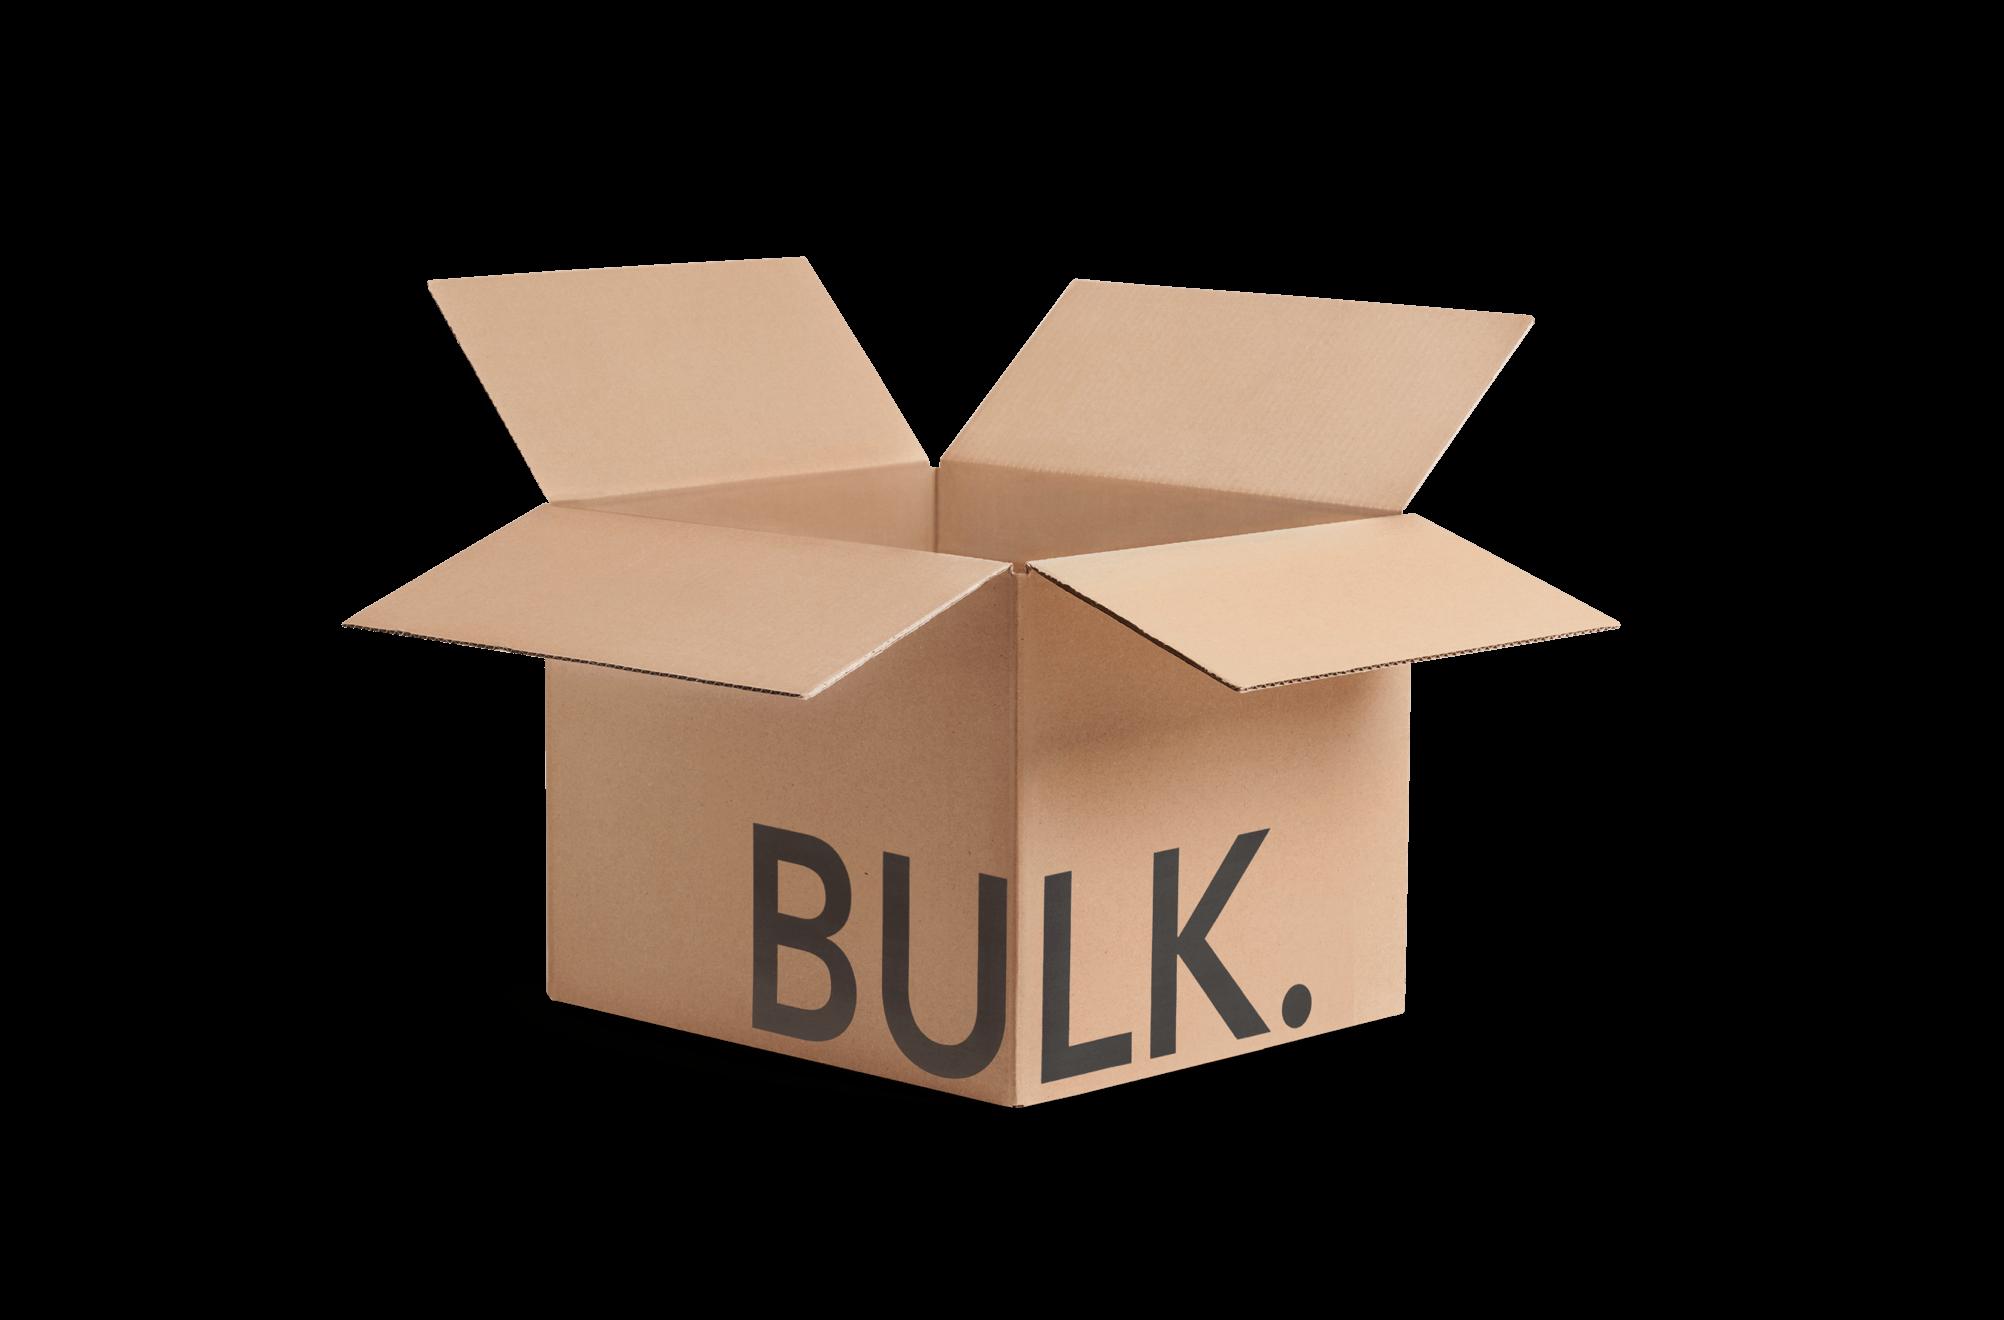 Shipping box with sample logo